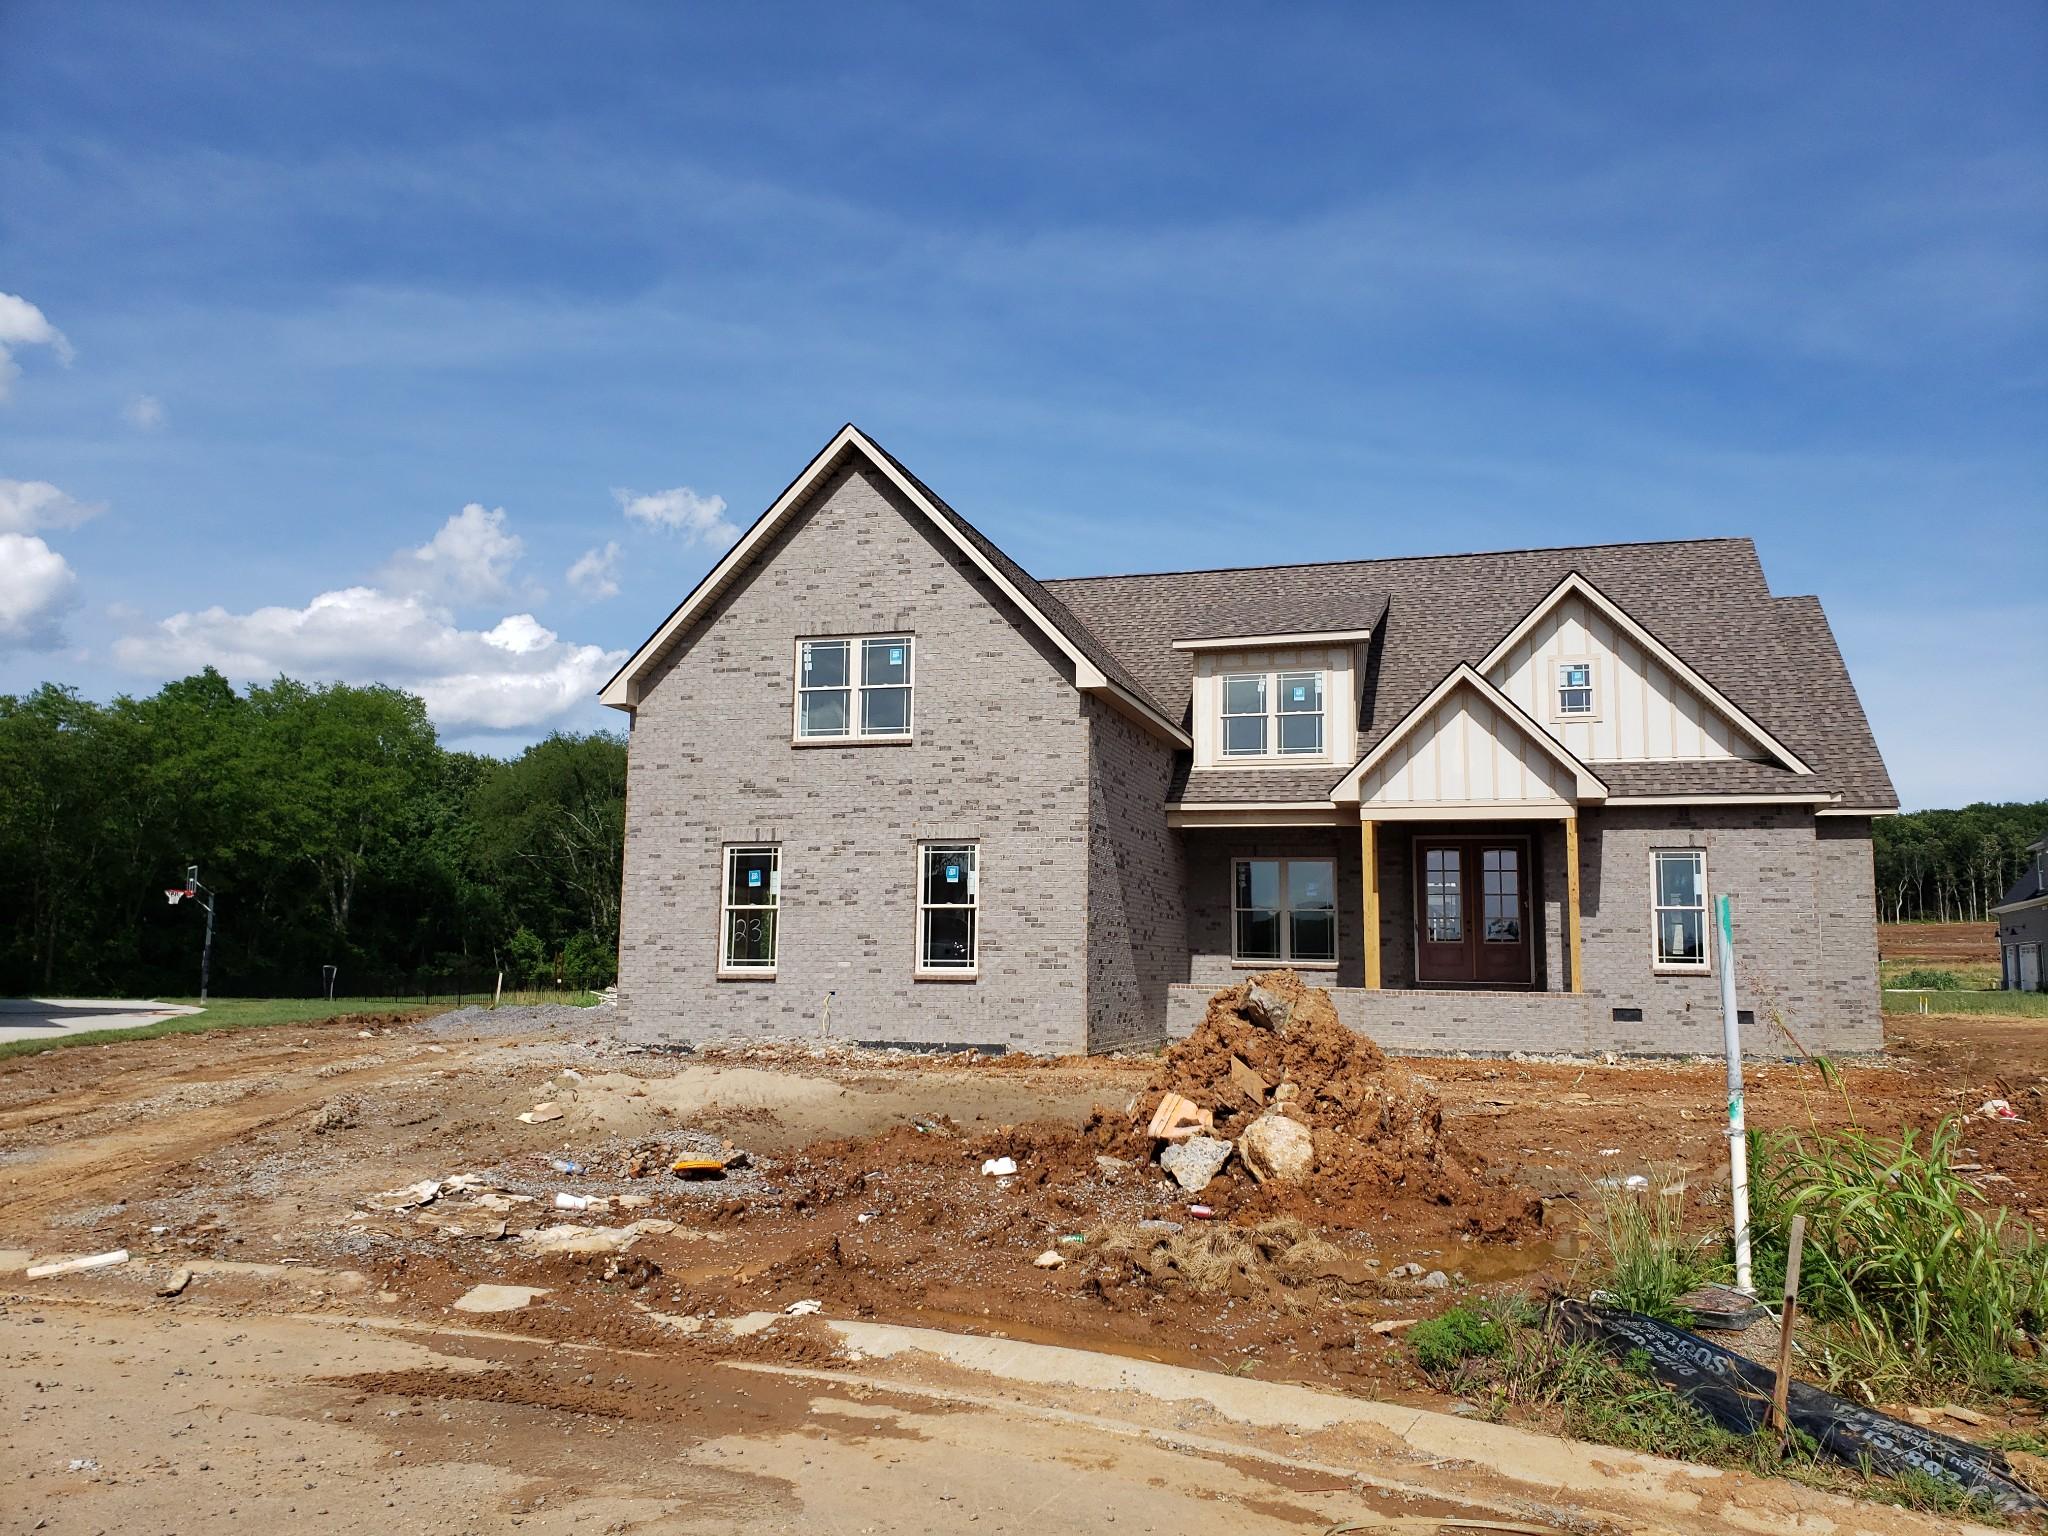 2910 Cooper City Ct Property Photo - Murfreesboro, TN real estate listing